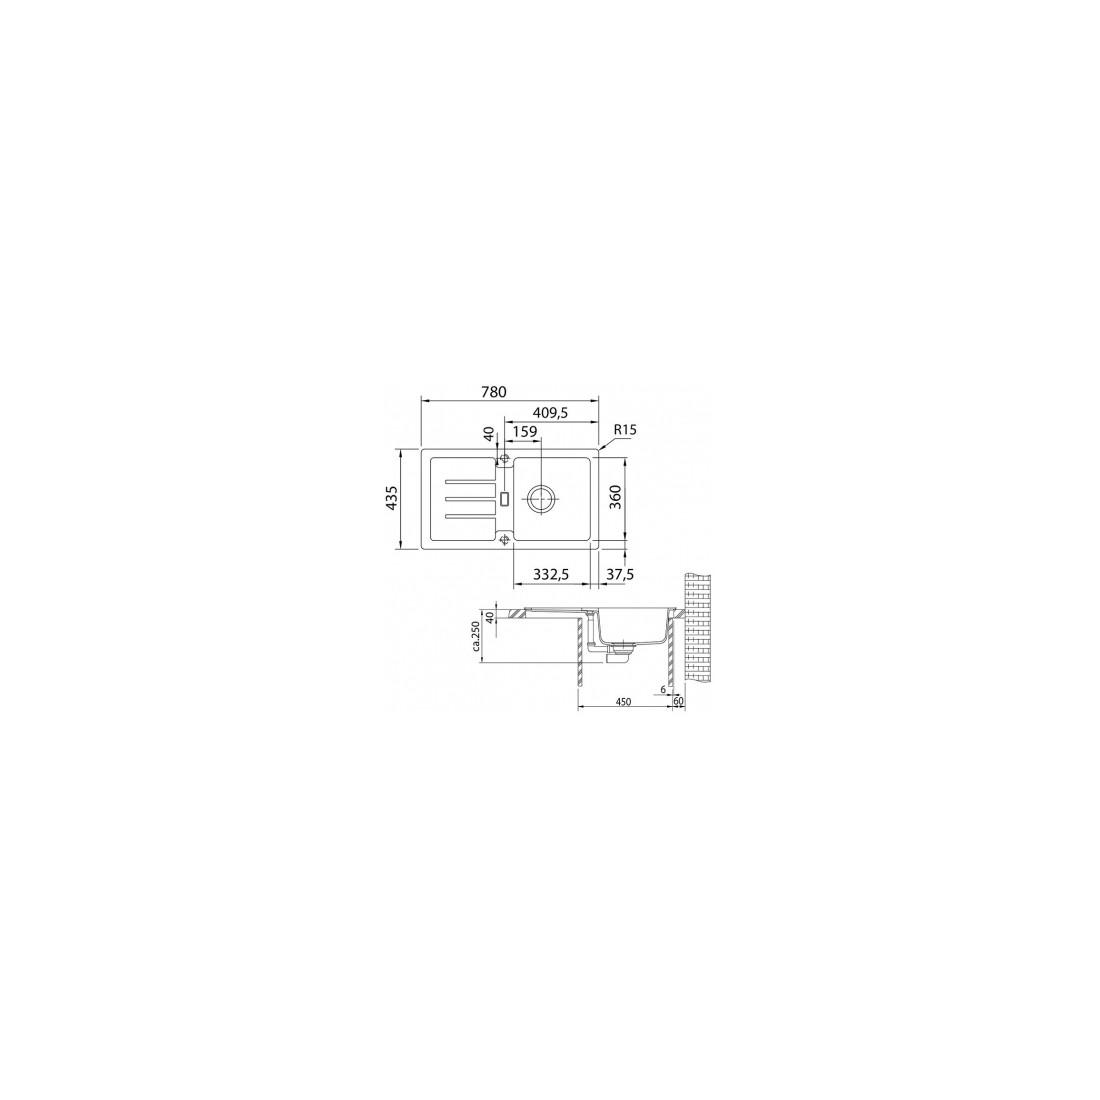 Akmens masės plautuvė Franke Strata, STG 614-78, Graphit, užkemšamas ventilis